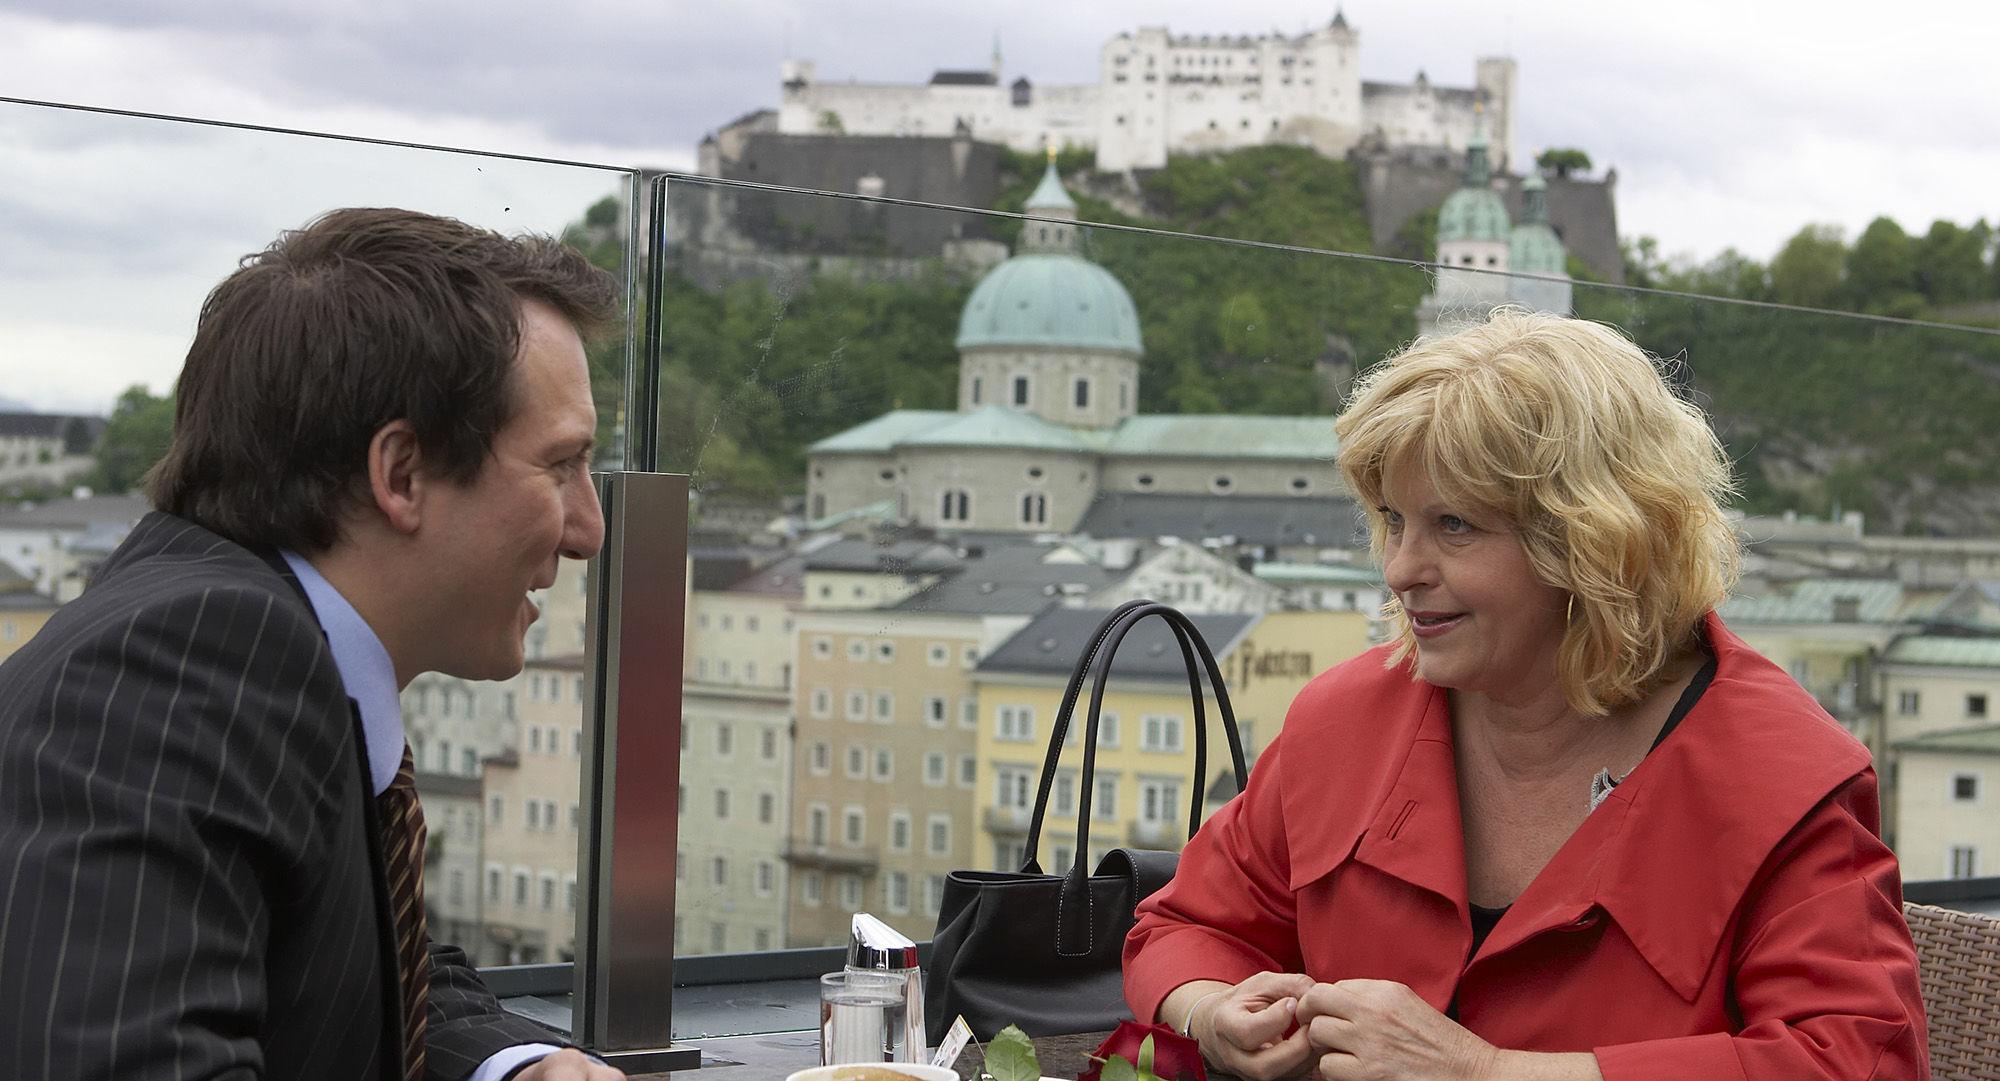 Robert Palfrader (Sarahs Date), Elfi Eschke (Sarah Horrowitz)